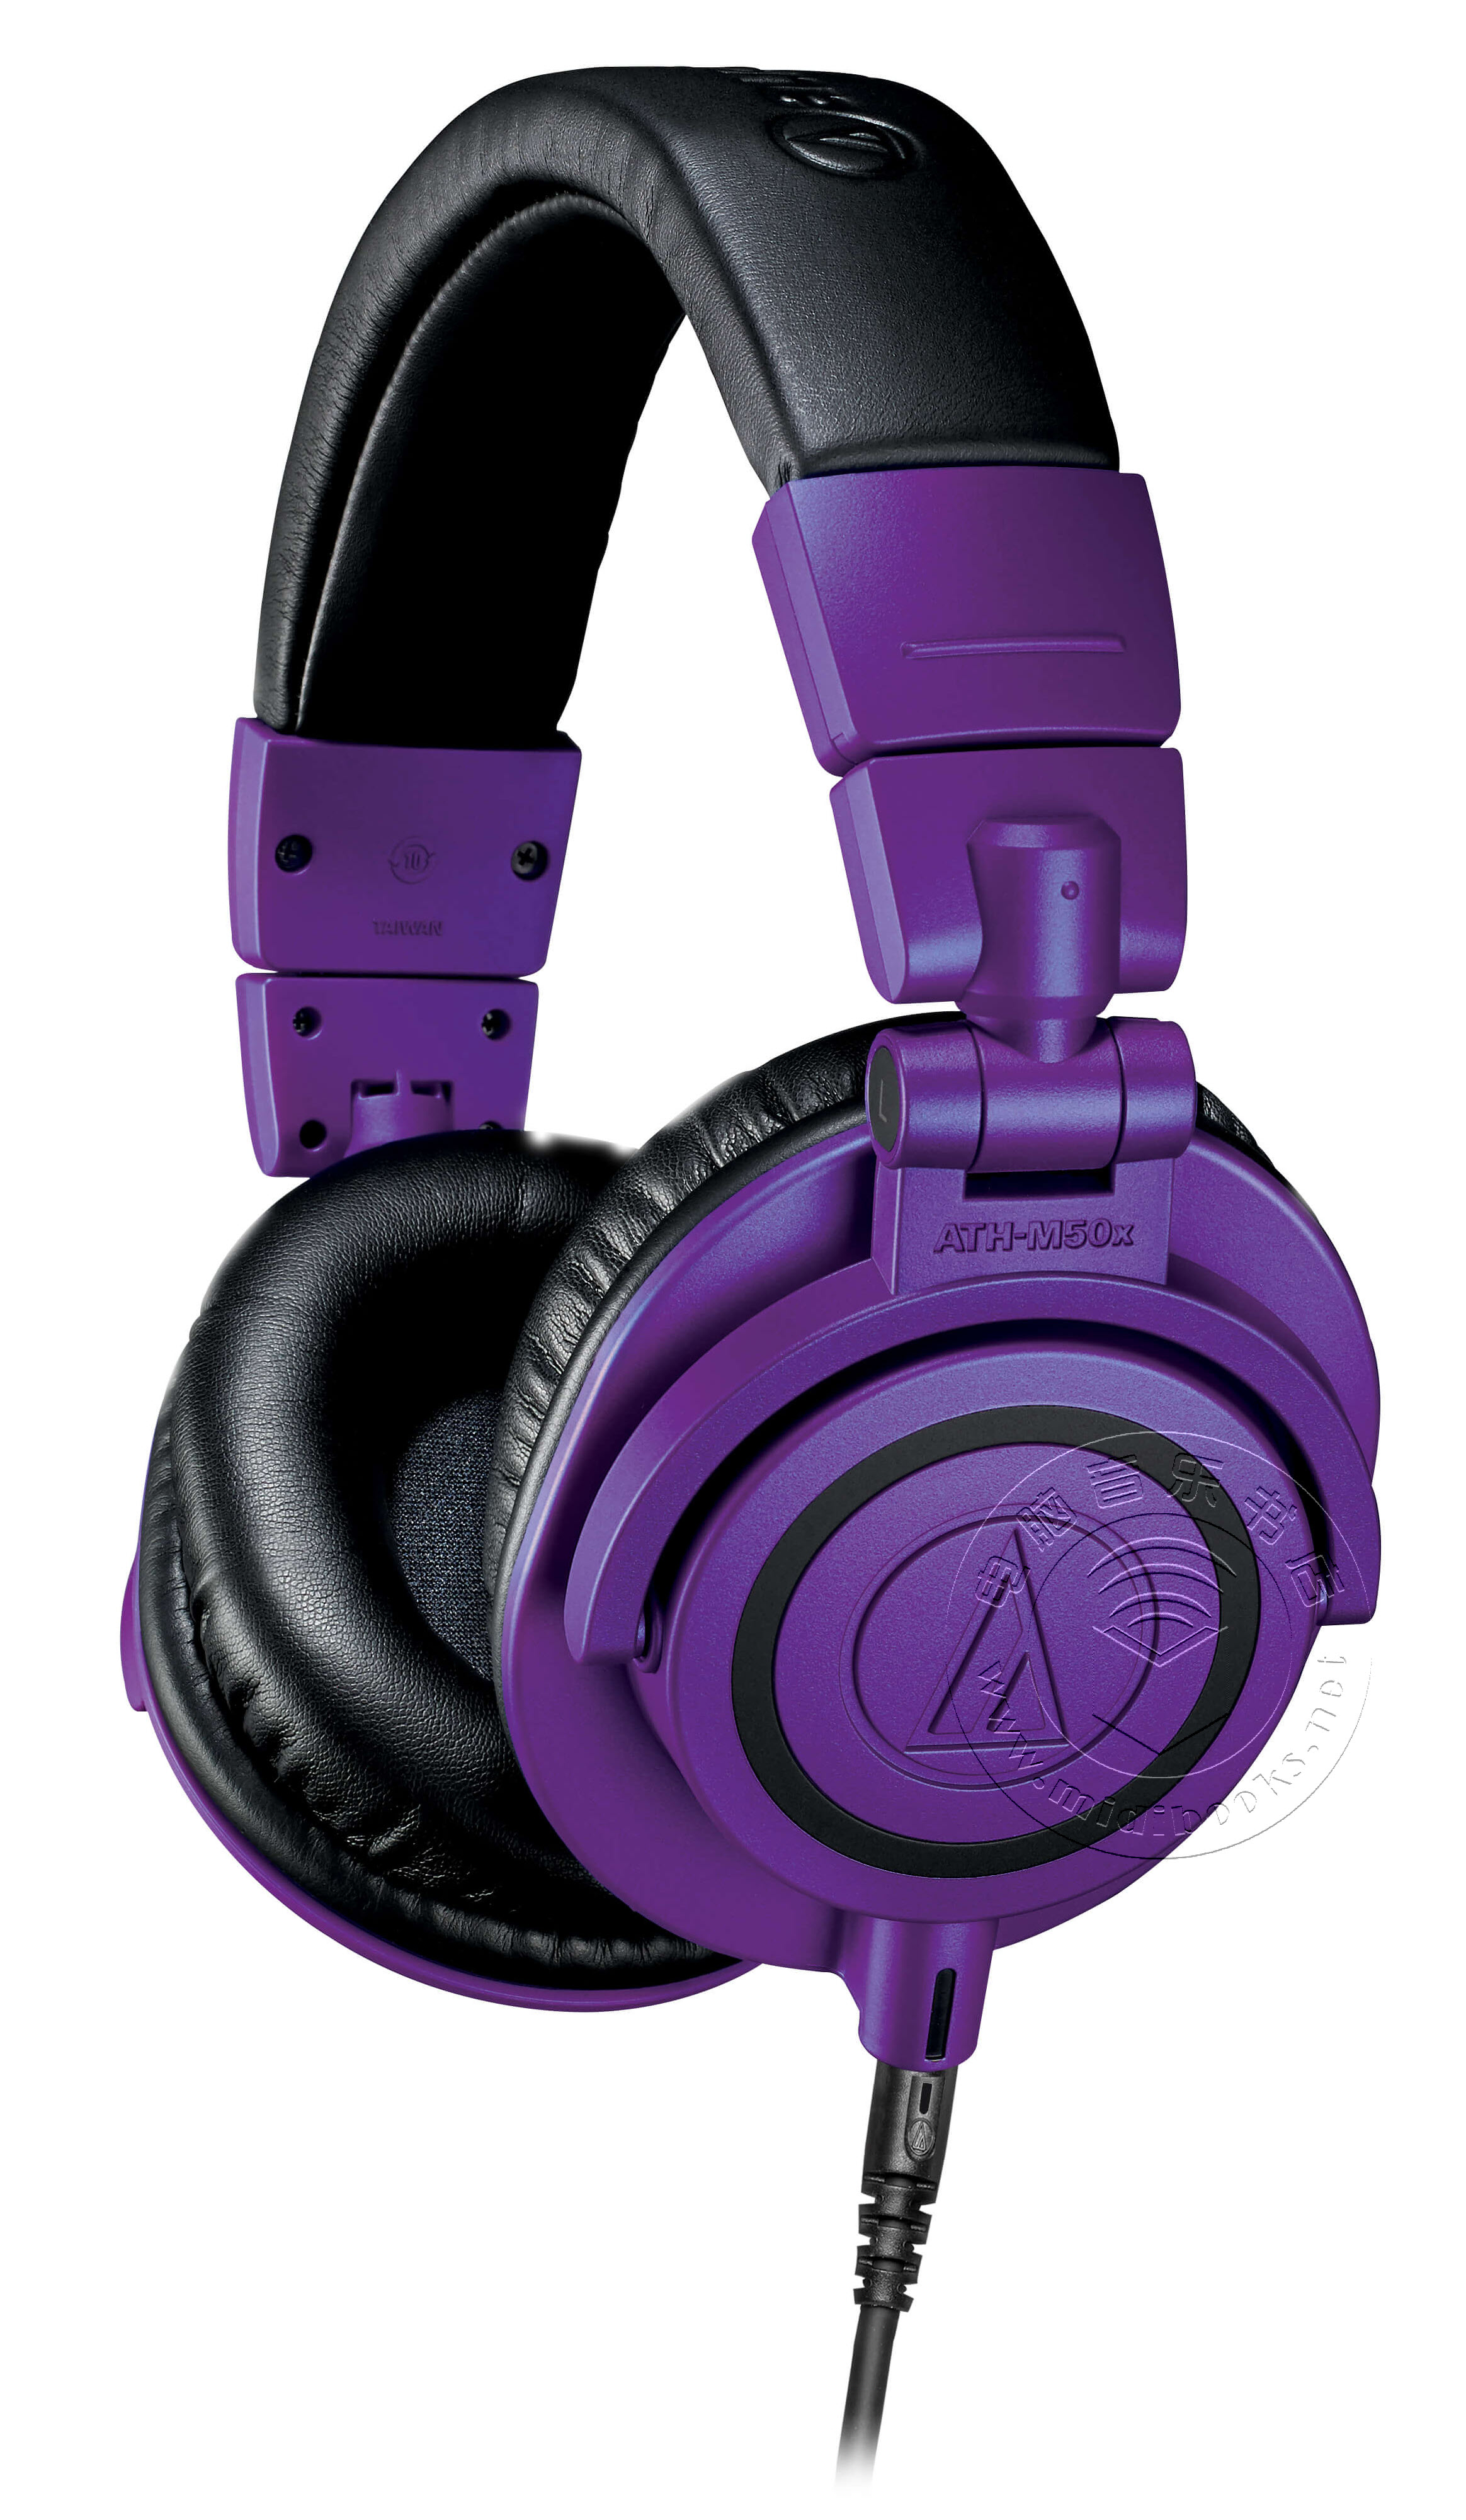 Audio-Technica推出限量版紫色和黑色监听耳机